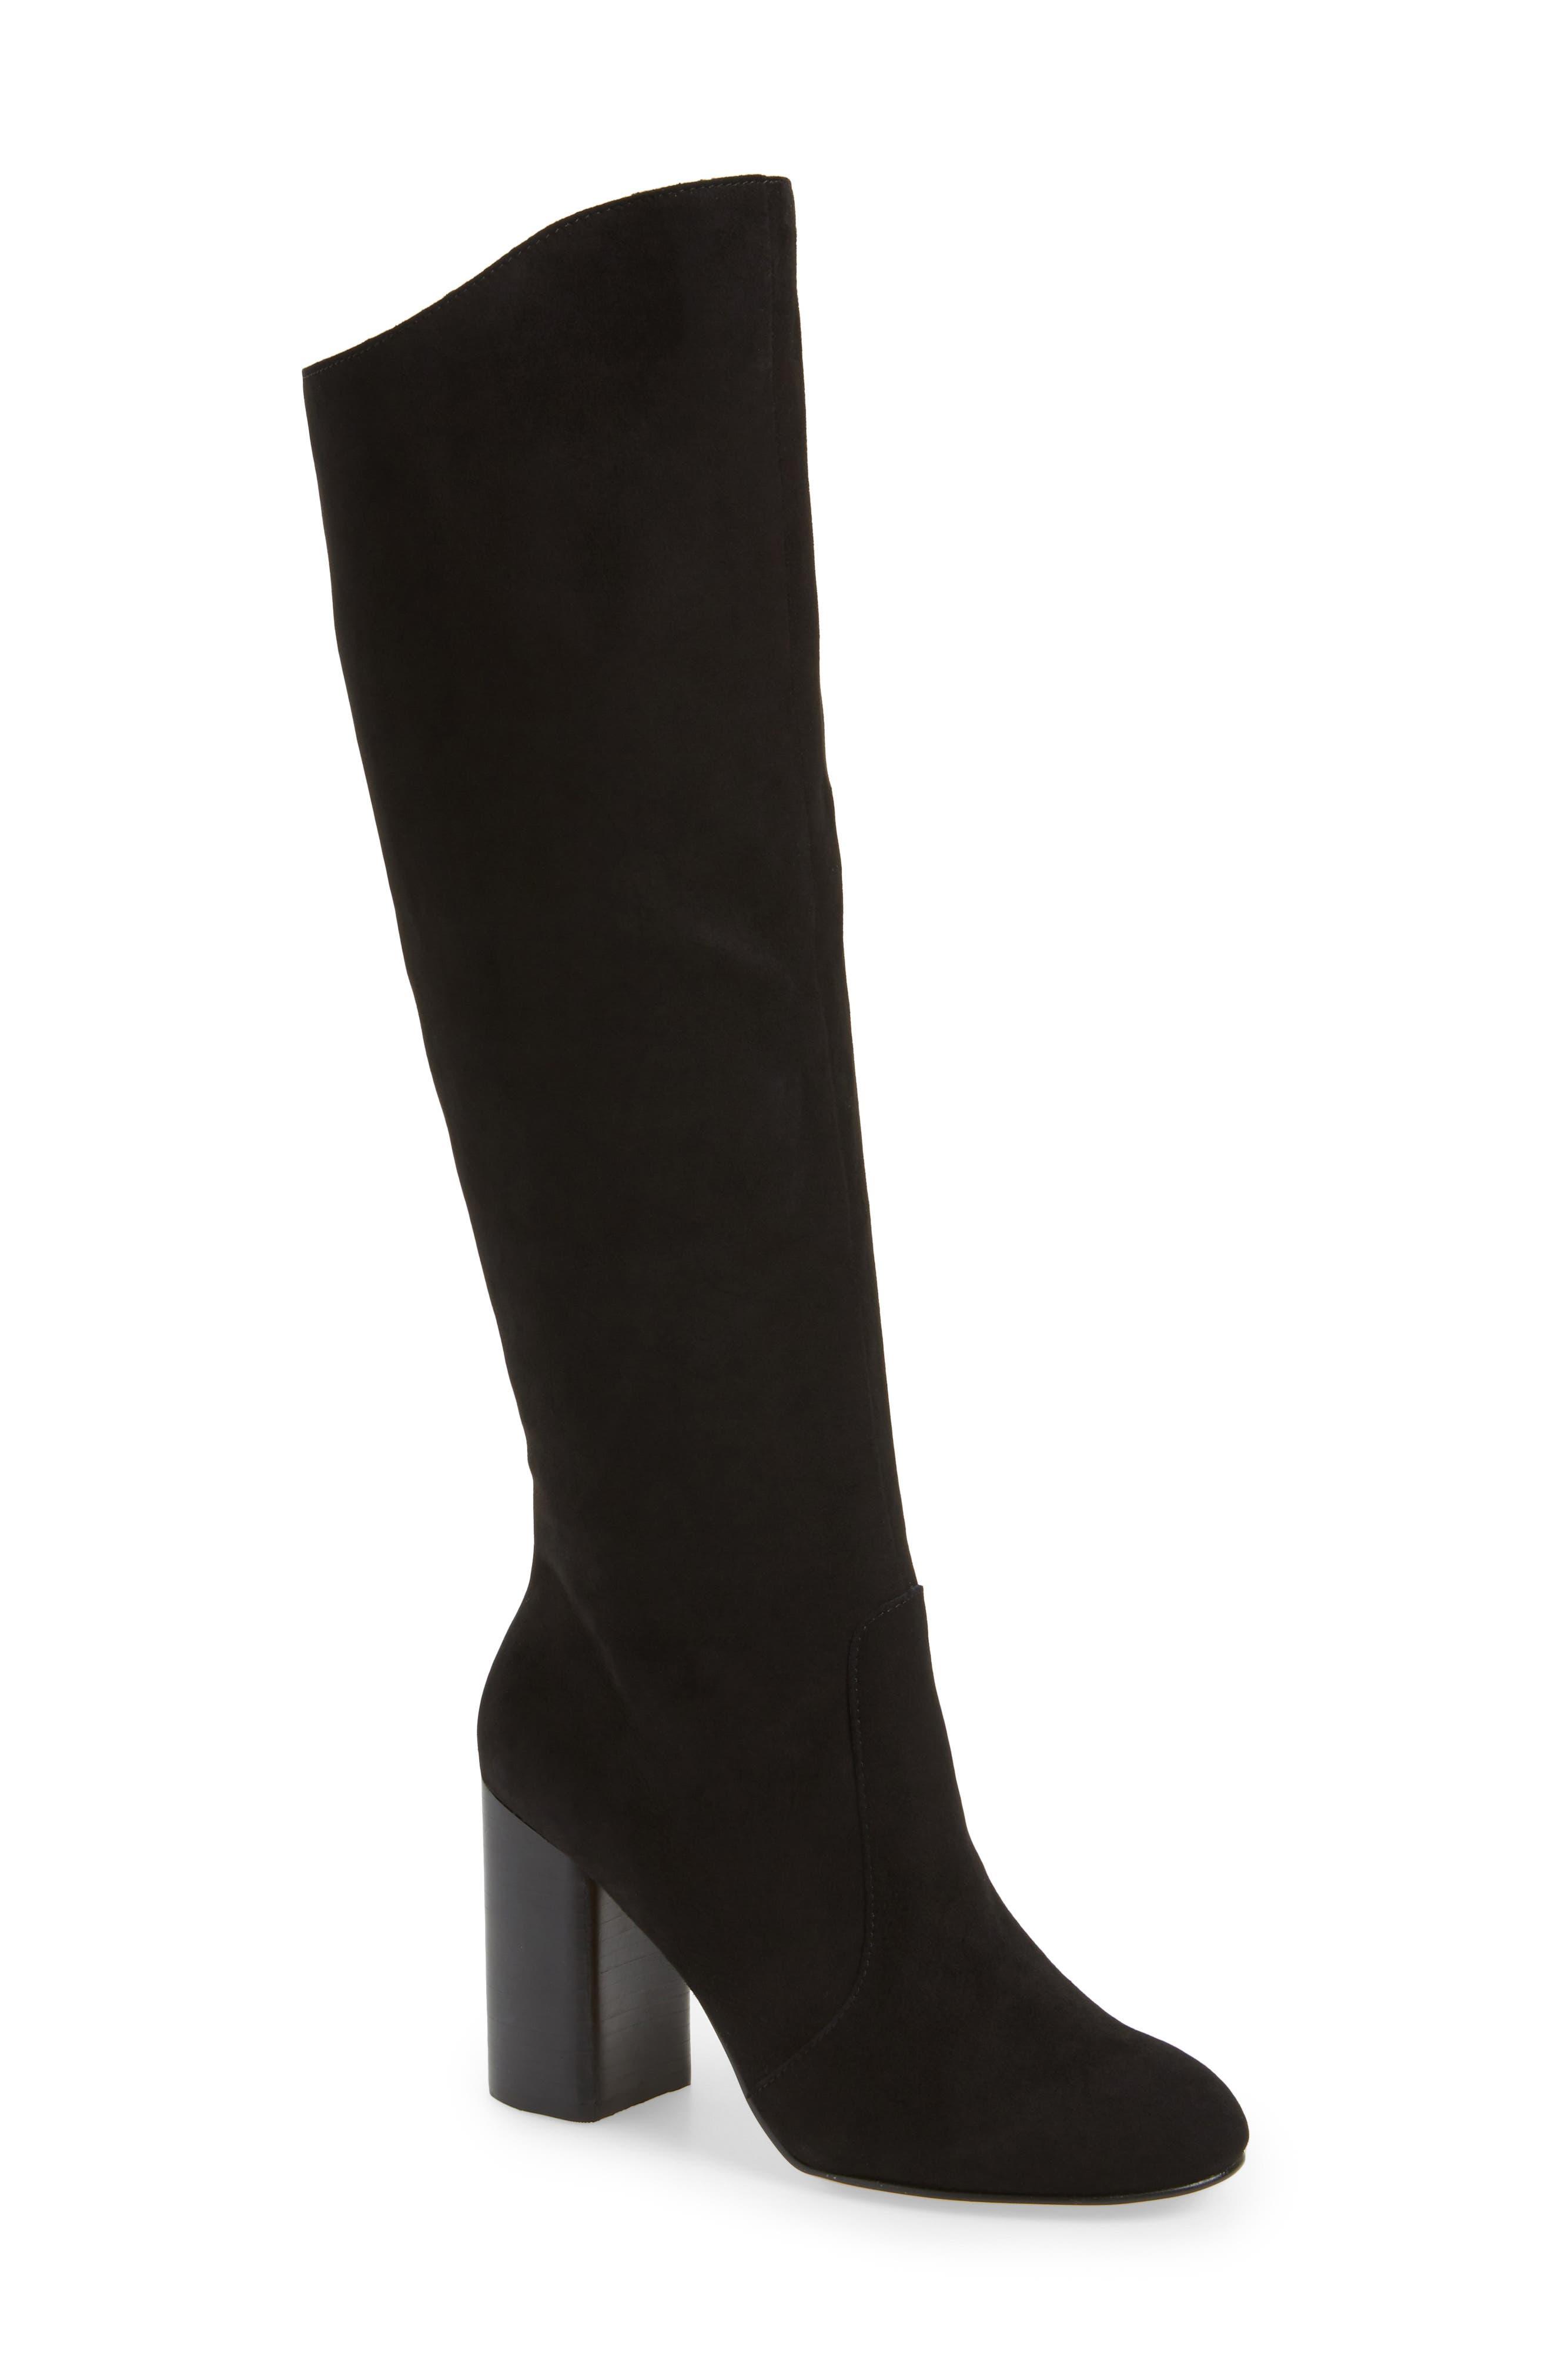 Alternate Image 1 Selected - Dolce Vita Rhea Knee High Boot (Women)